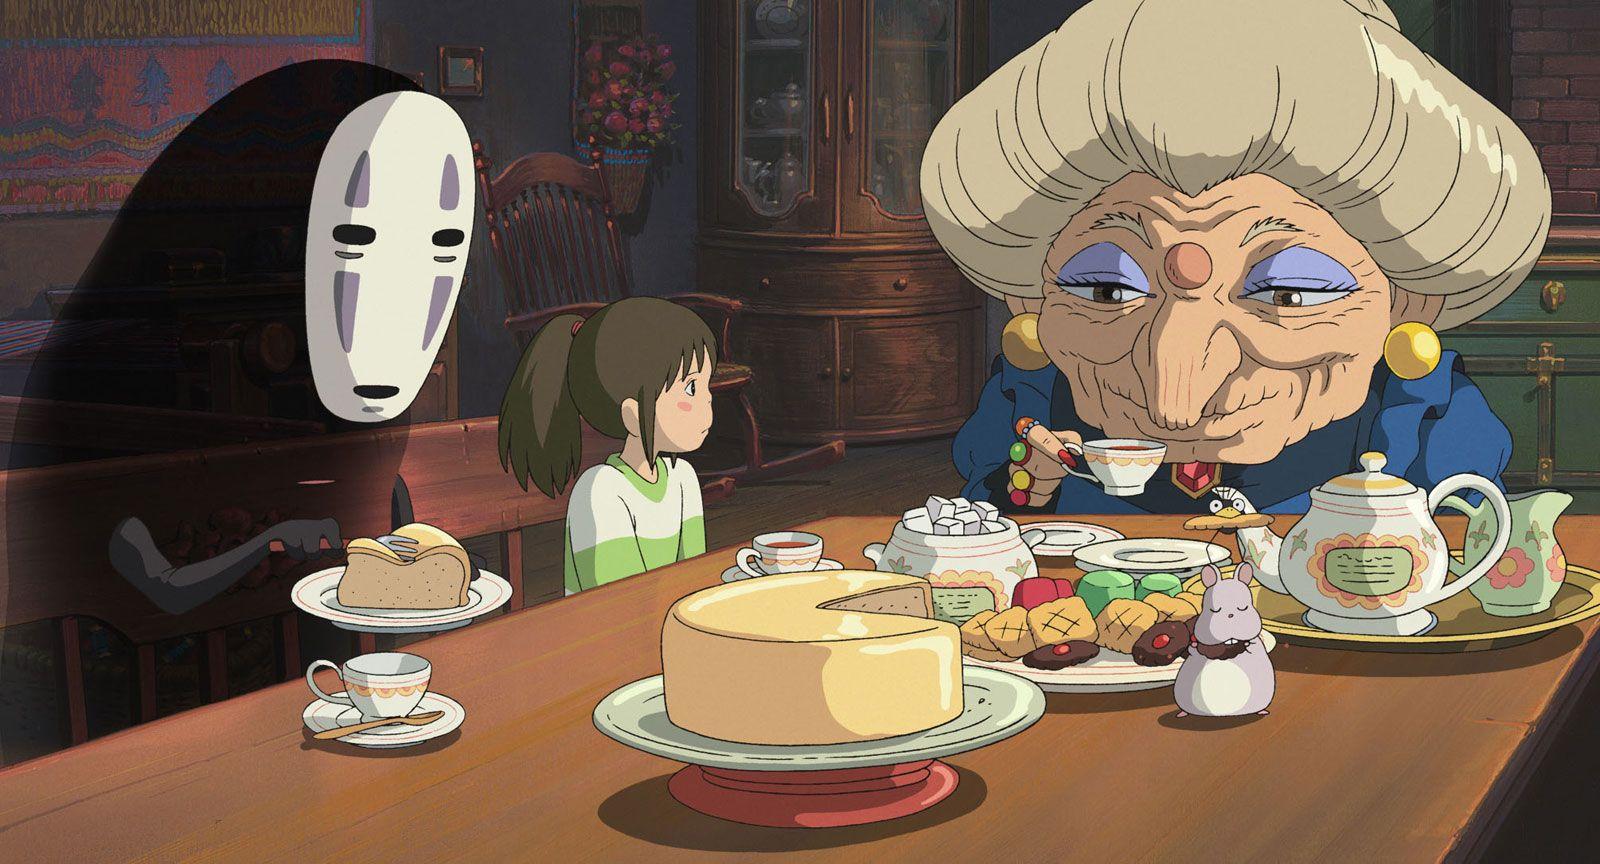 Spirited Away studio ghibli Miyazaki film